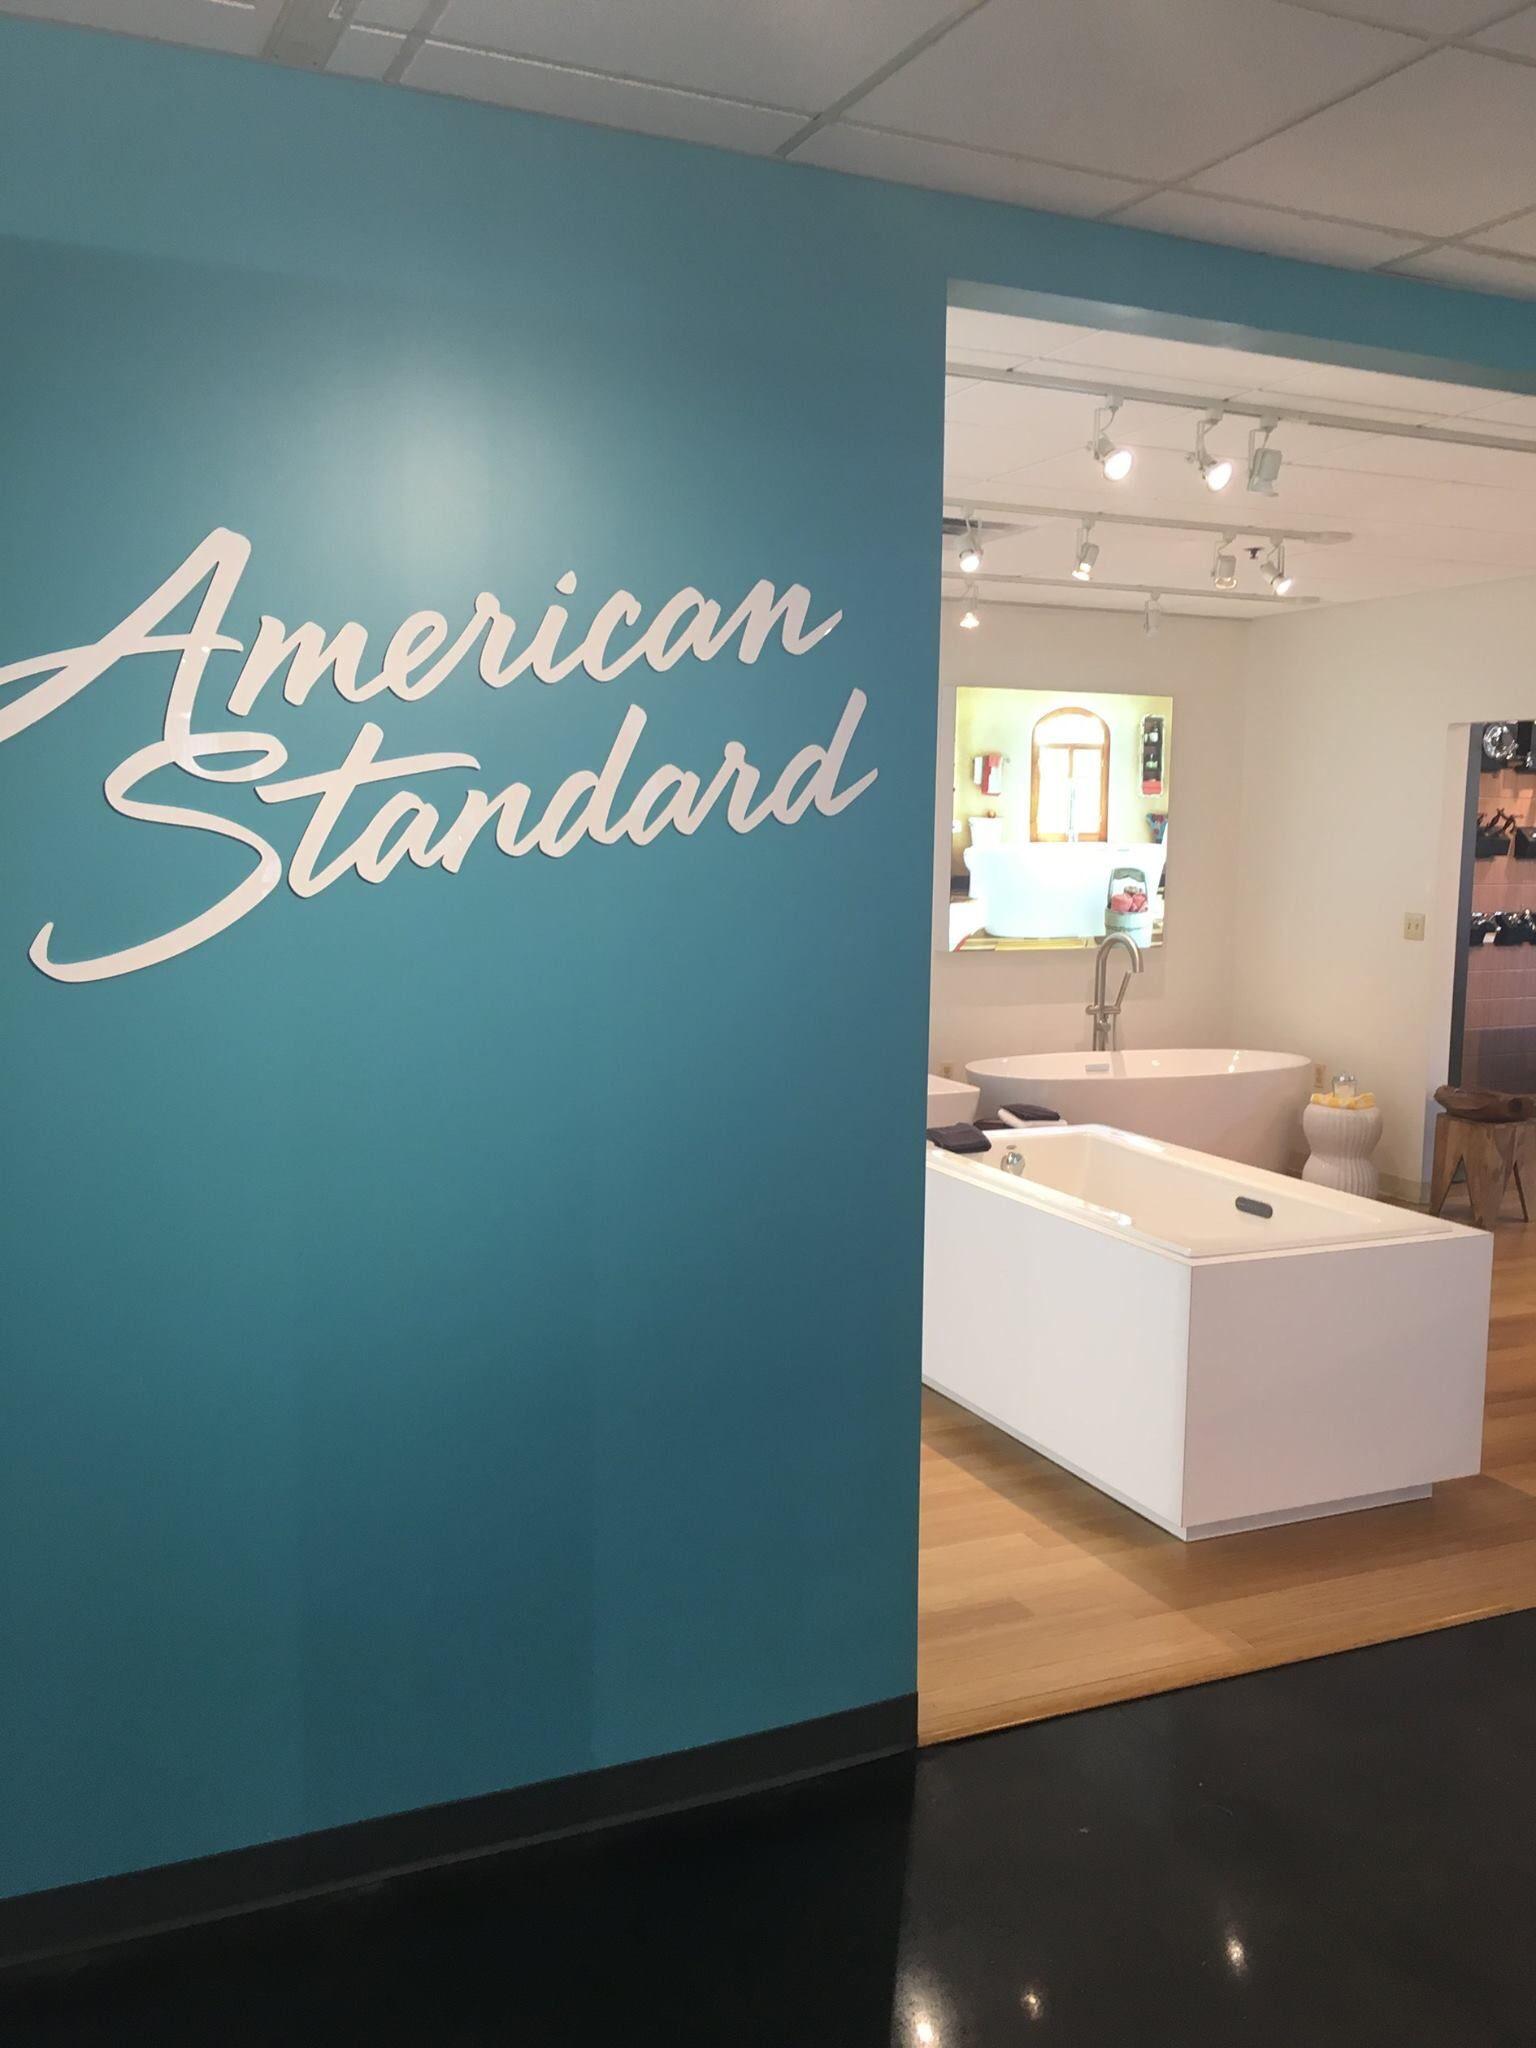 American Standard Showroom NYC | American Standard Showroom NYC ...